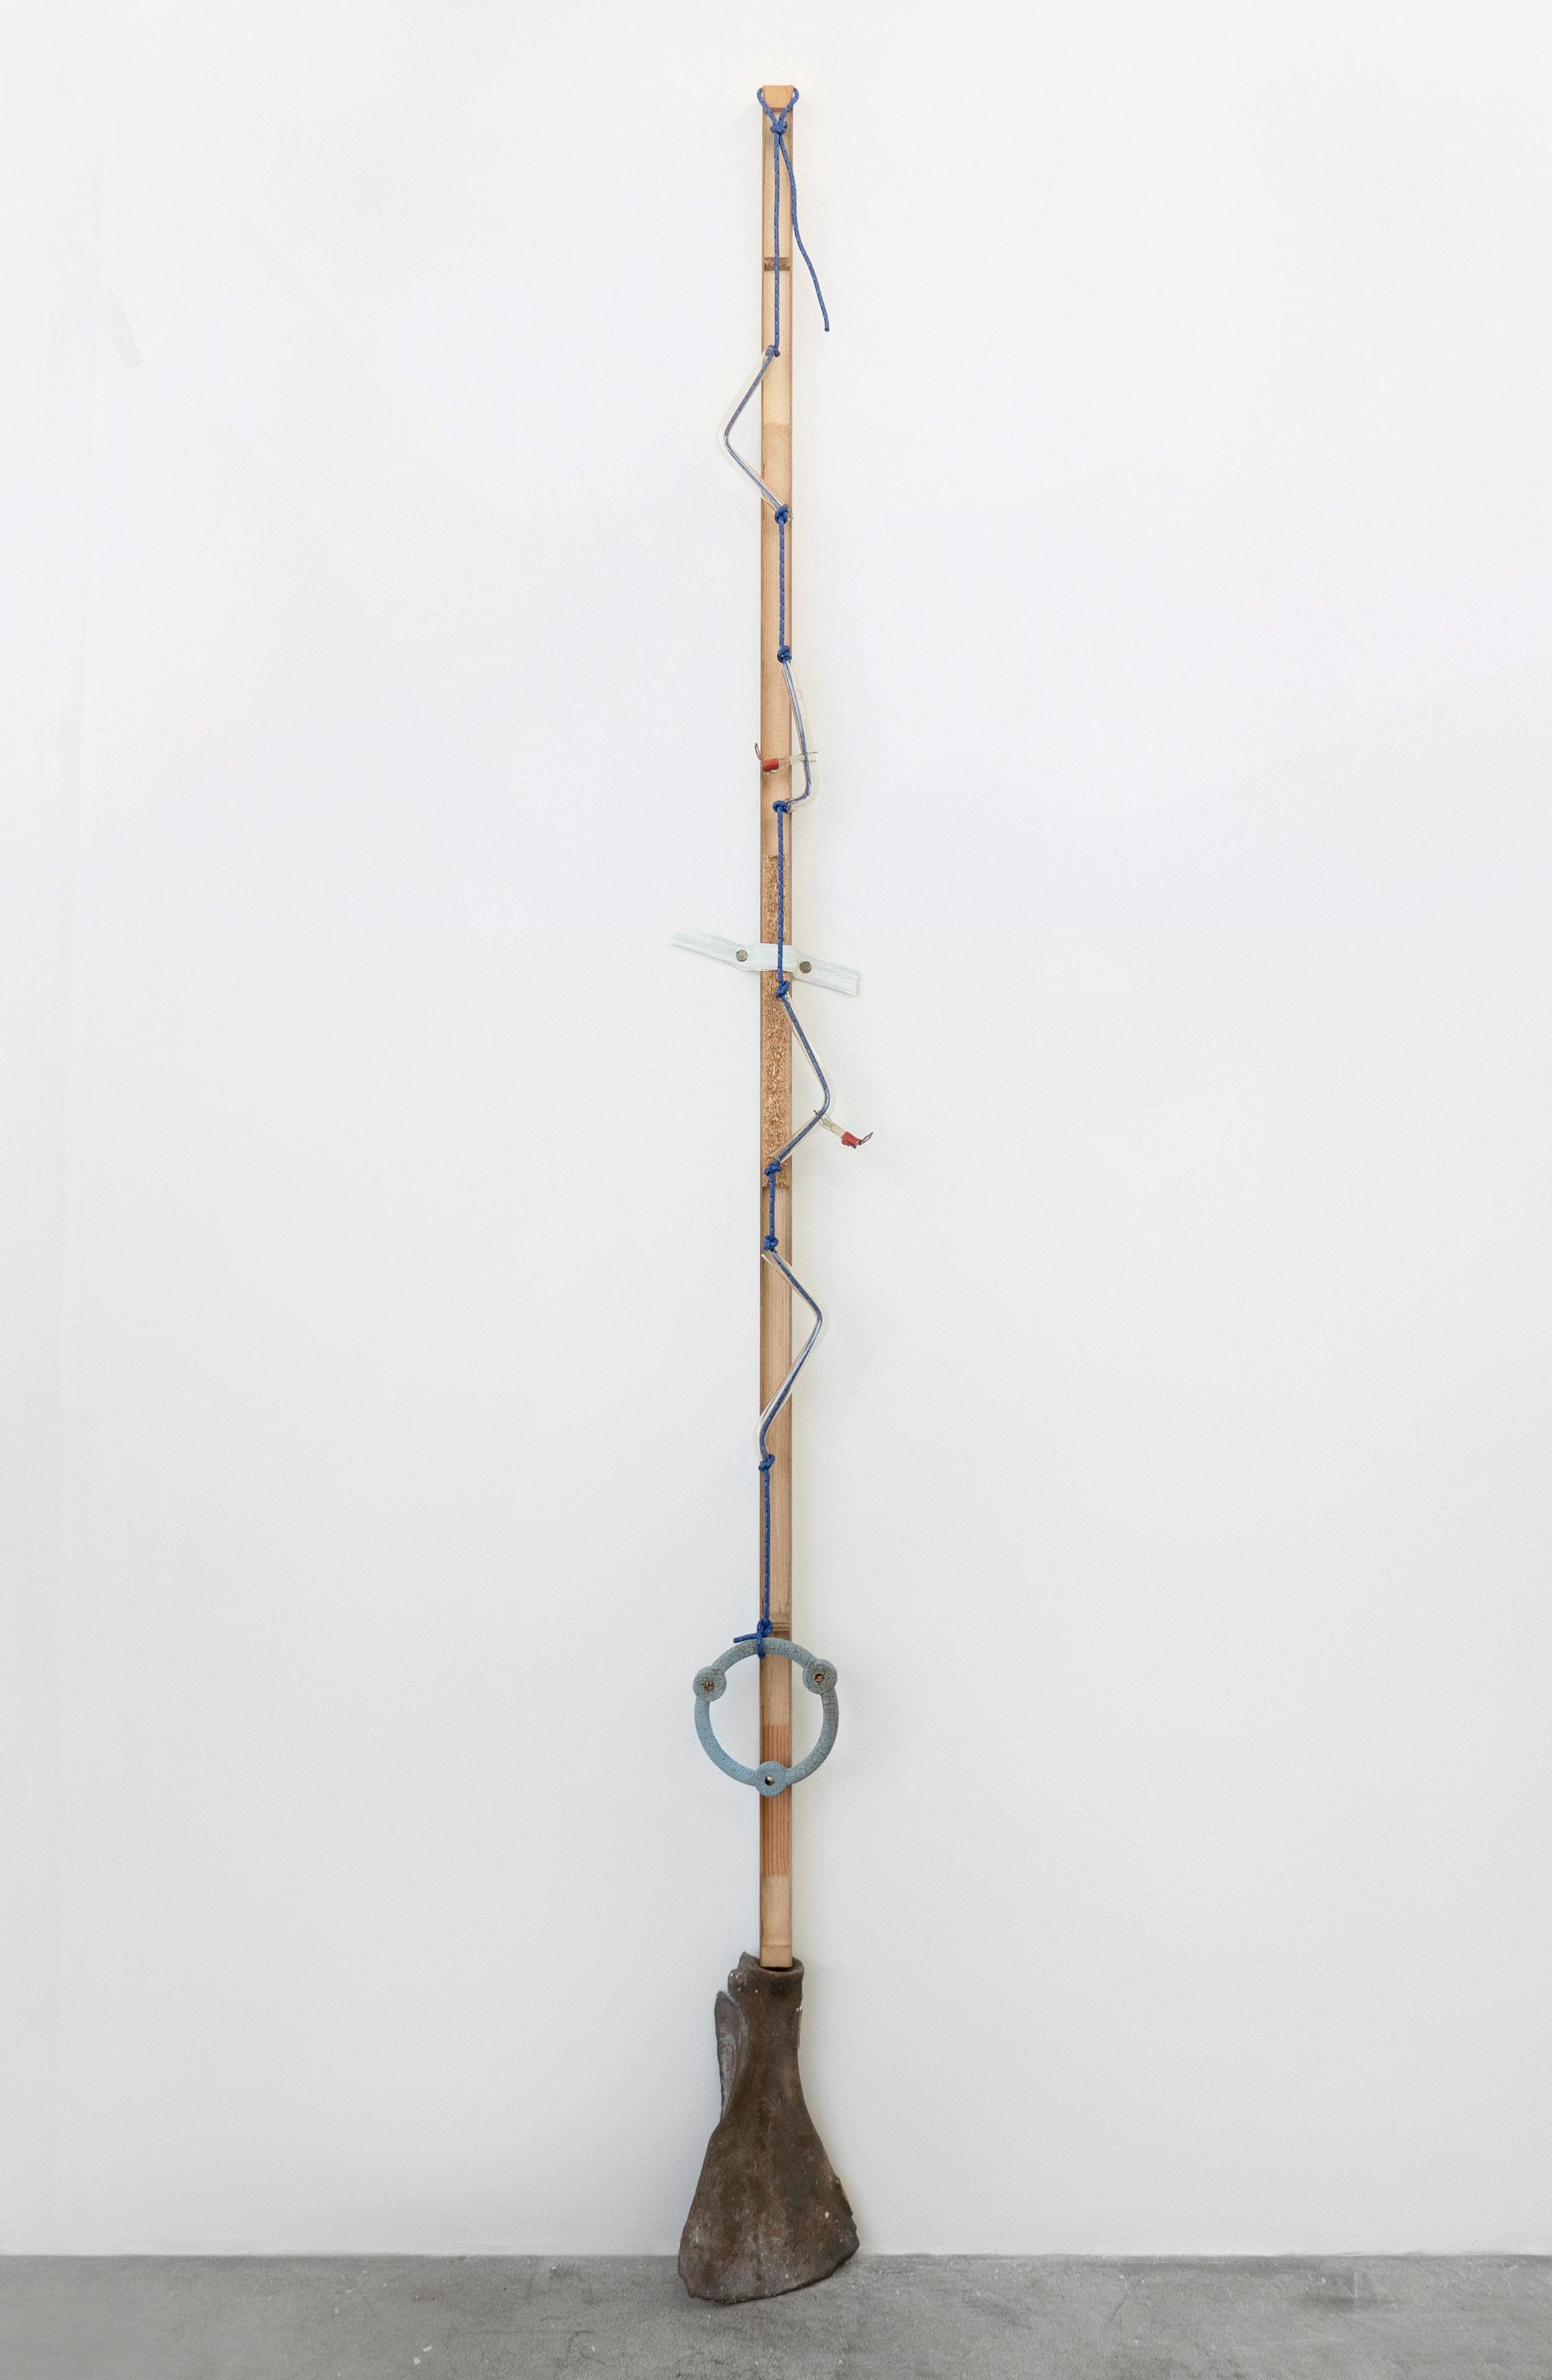 Matt Siegel,  E , 2018, Raw bronze, hollow core door, accessory cord, neon glass tubing (sourced: abandoned China Buffet, Evanston, WY), found object, fire, 92 x 8 x 5 in